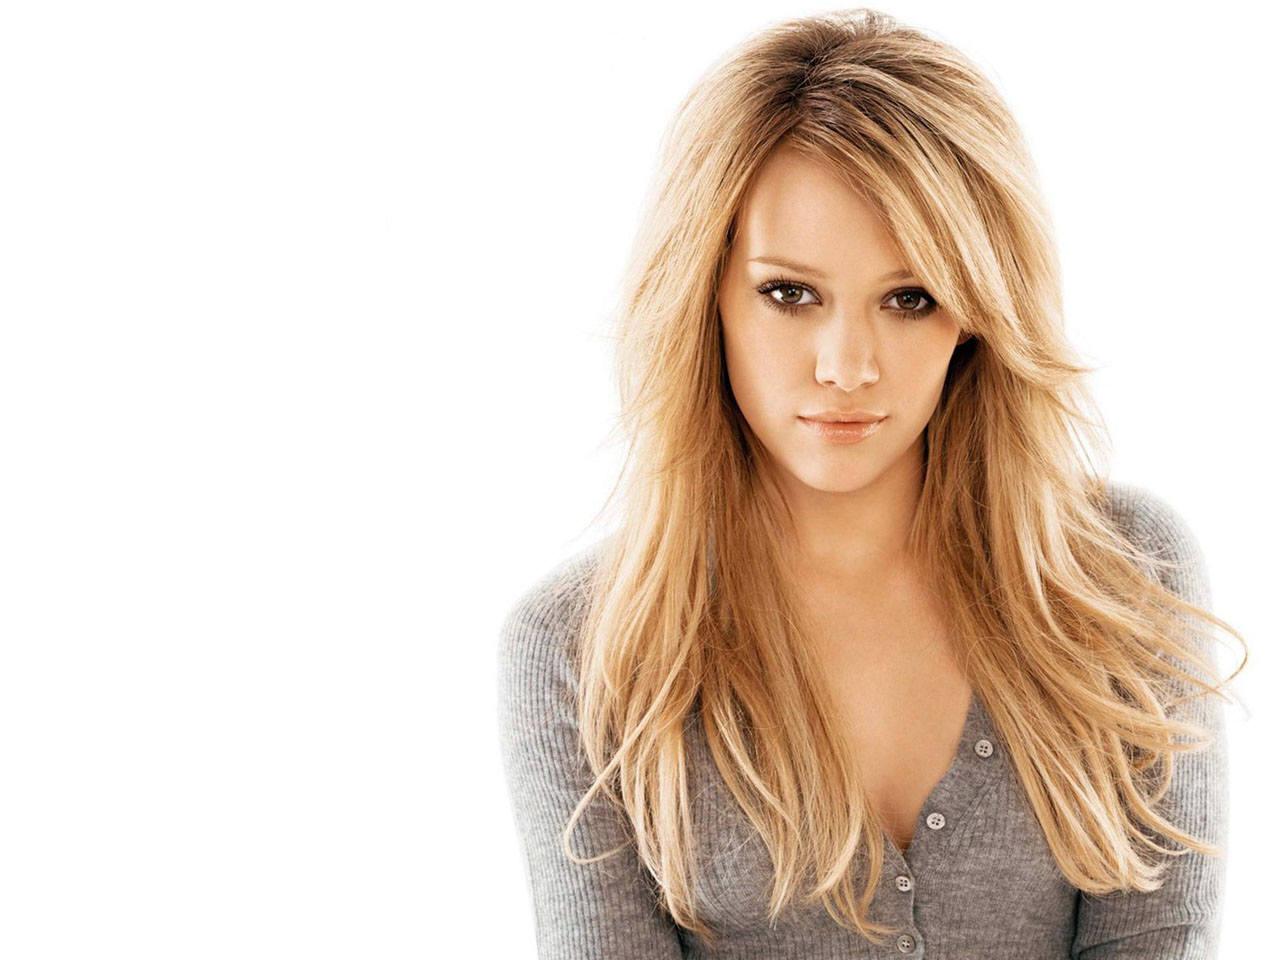 http://3.bp.blogspot.com/-Oh-h992JvRY/TnYCj71yxrI/AAAAAAAAELQ/4fSYePHbkZs/s1600/Hilary-Duff-553.jpg